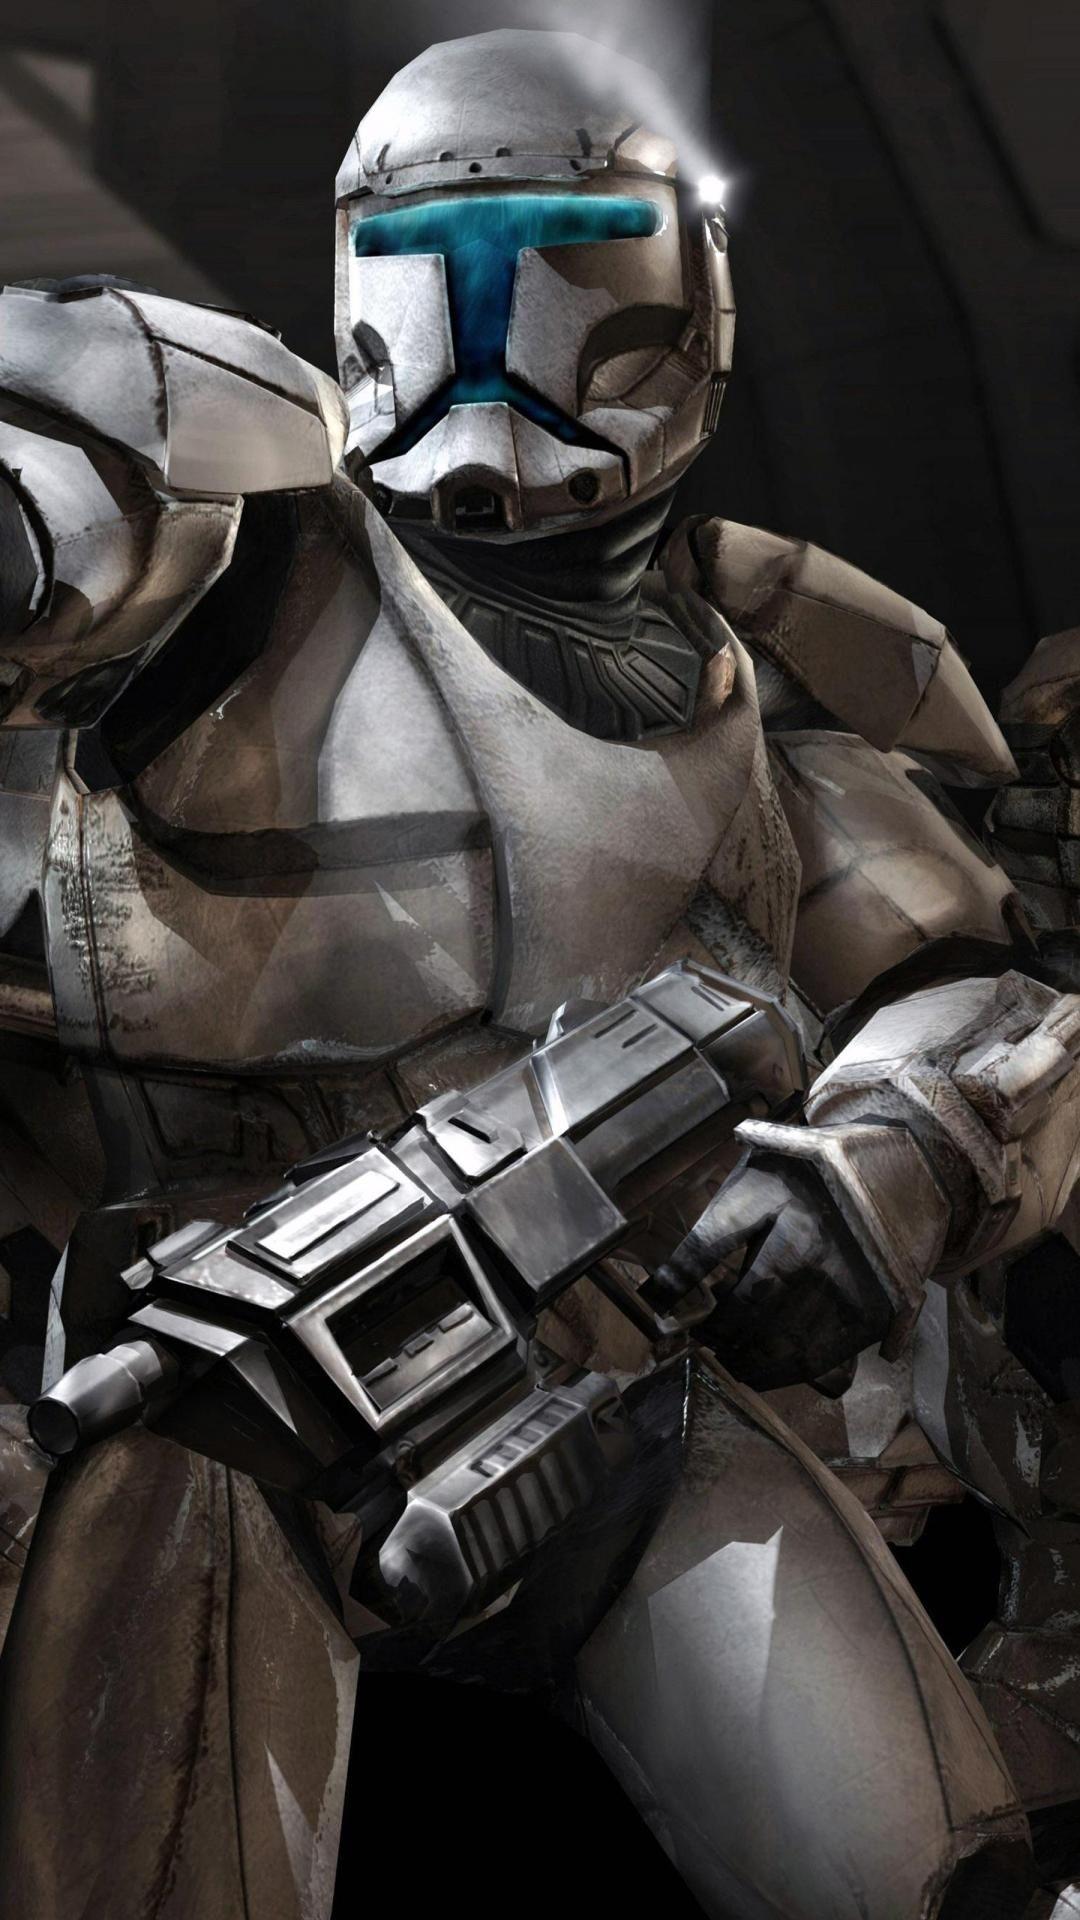 Star Wars Clone Trooper Iphone Wallpaper Download Popular Star